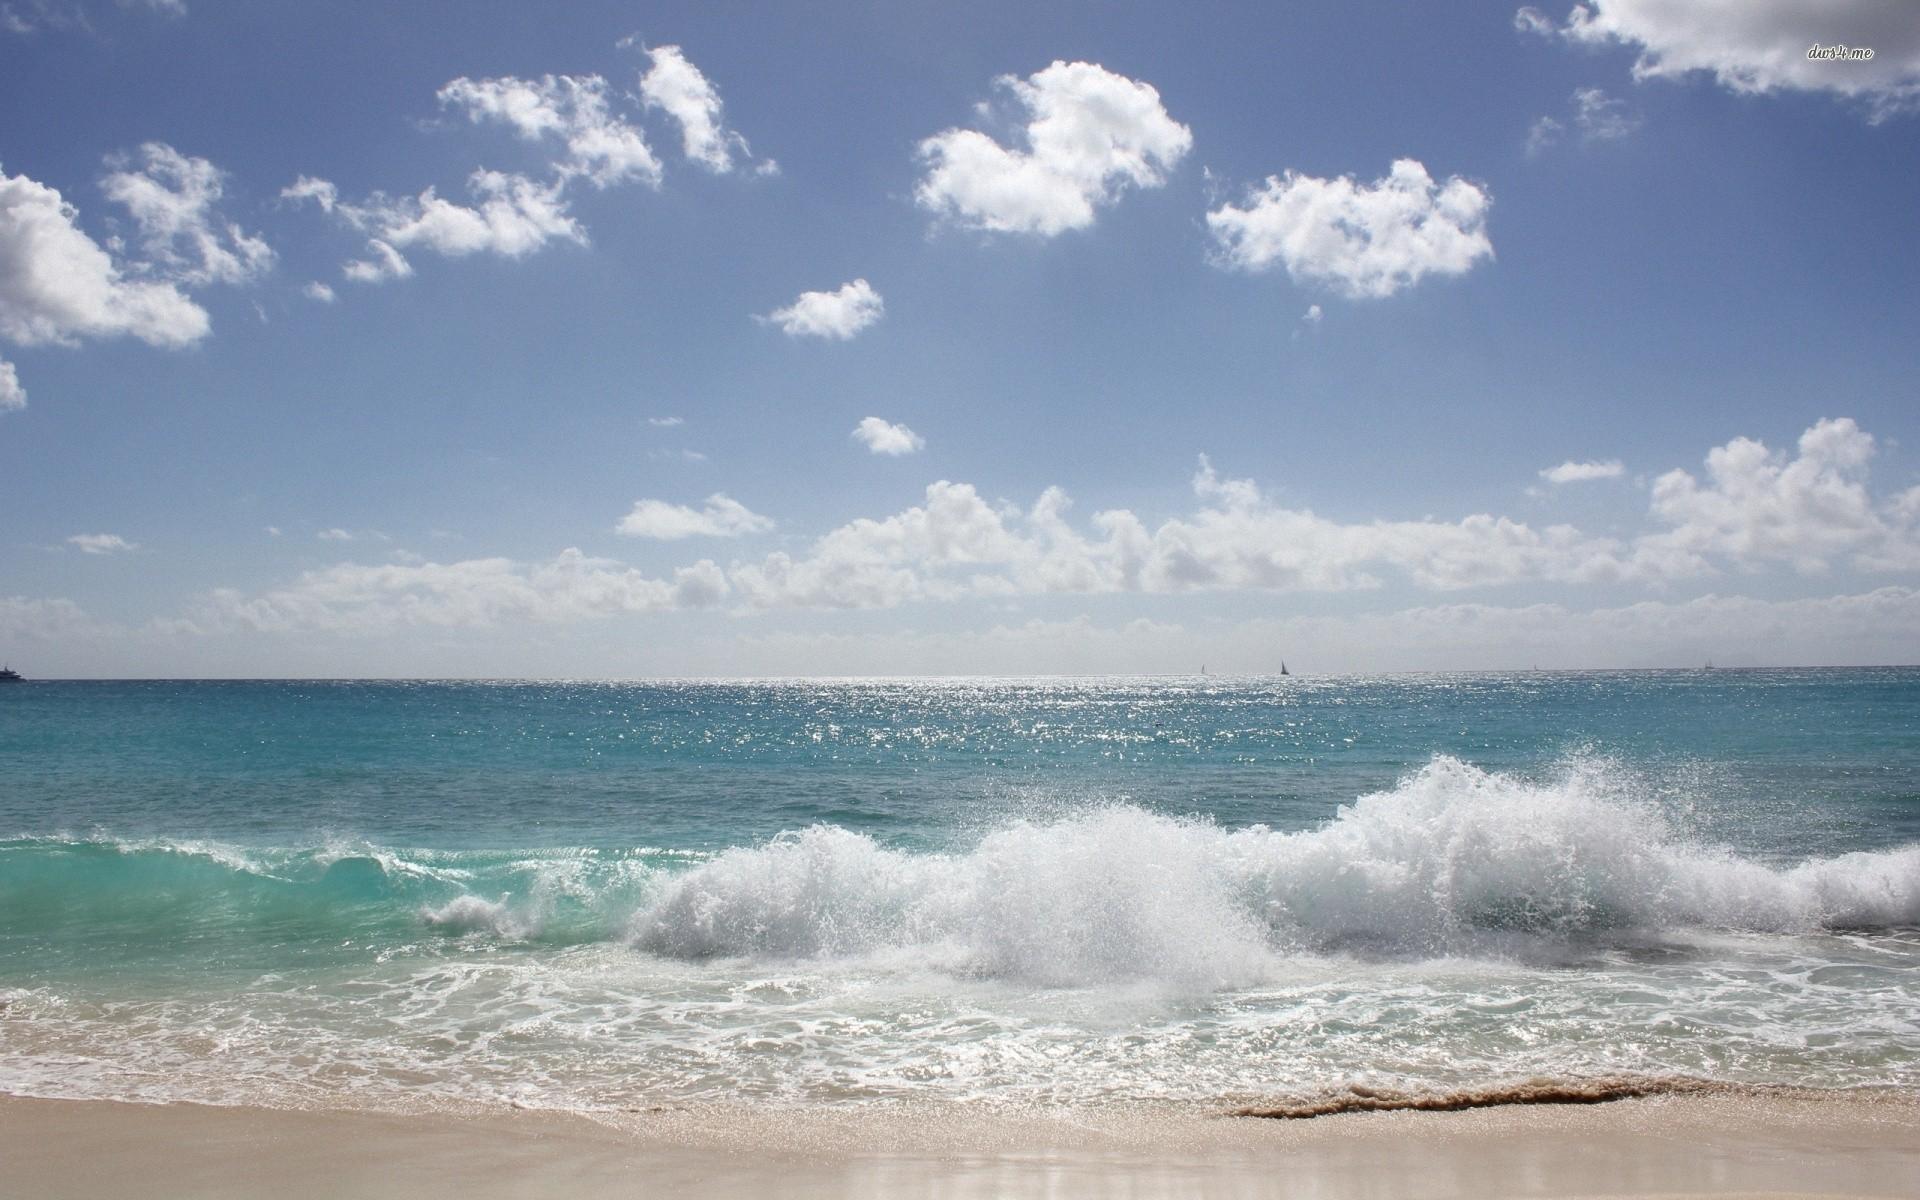 12794-waves-on-a-sunny-day-1920×1200-beach-wallpaper.jpg (1920×1200) |  Spiritual | Pinterest | Punta cana